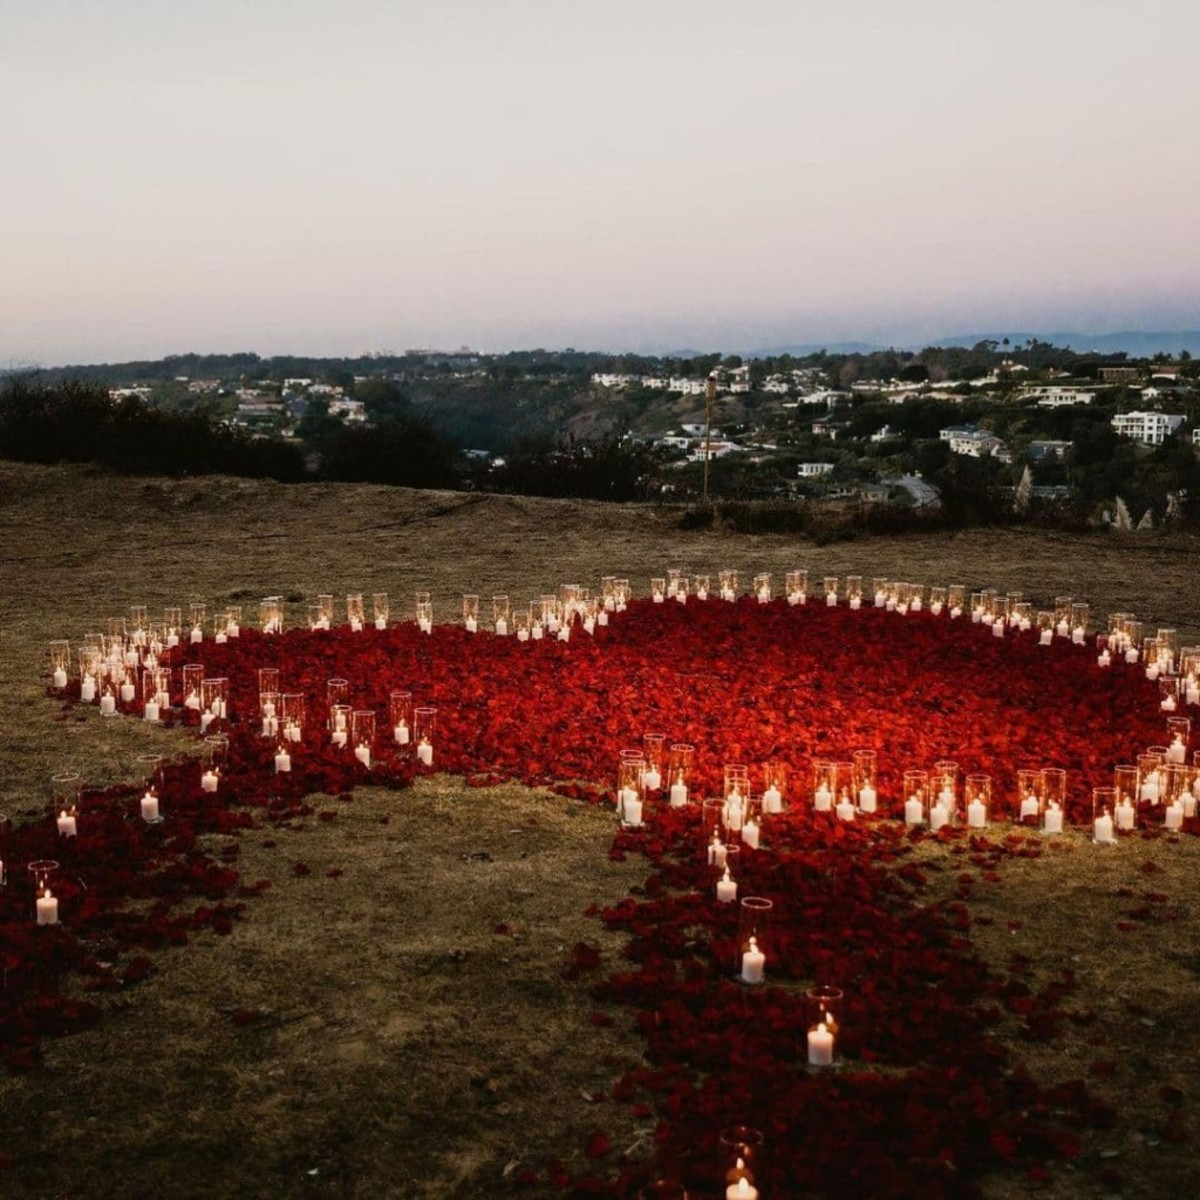 Tobias Harris Proposed To Girlfriend Jasmine With Amazing Setup